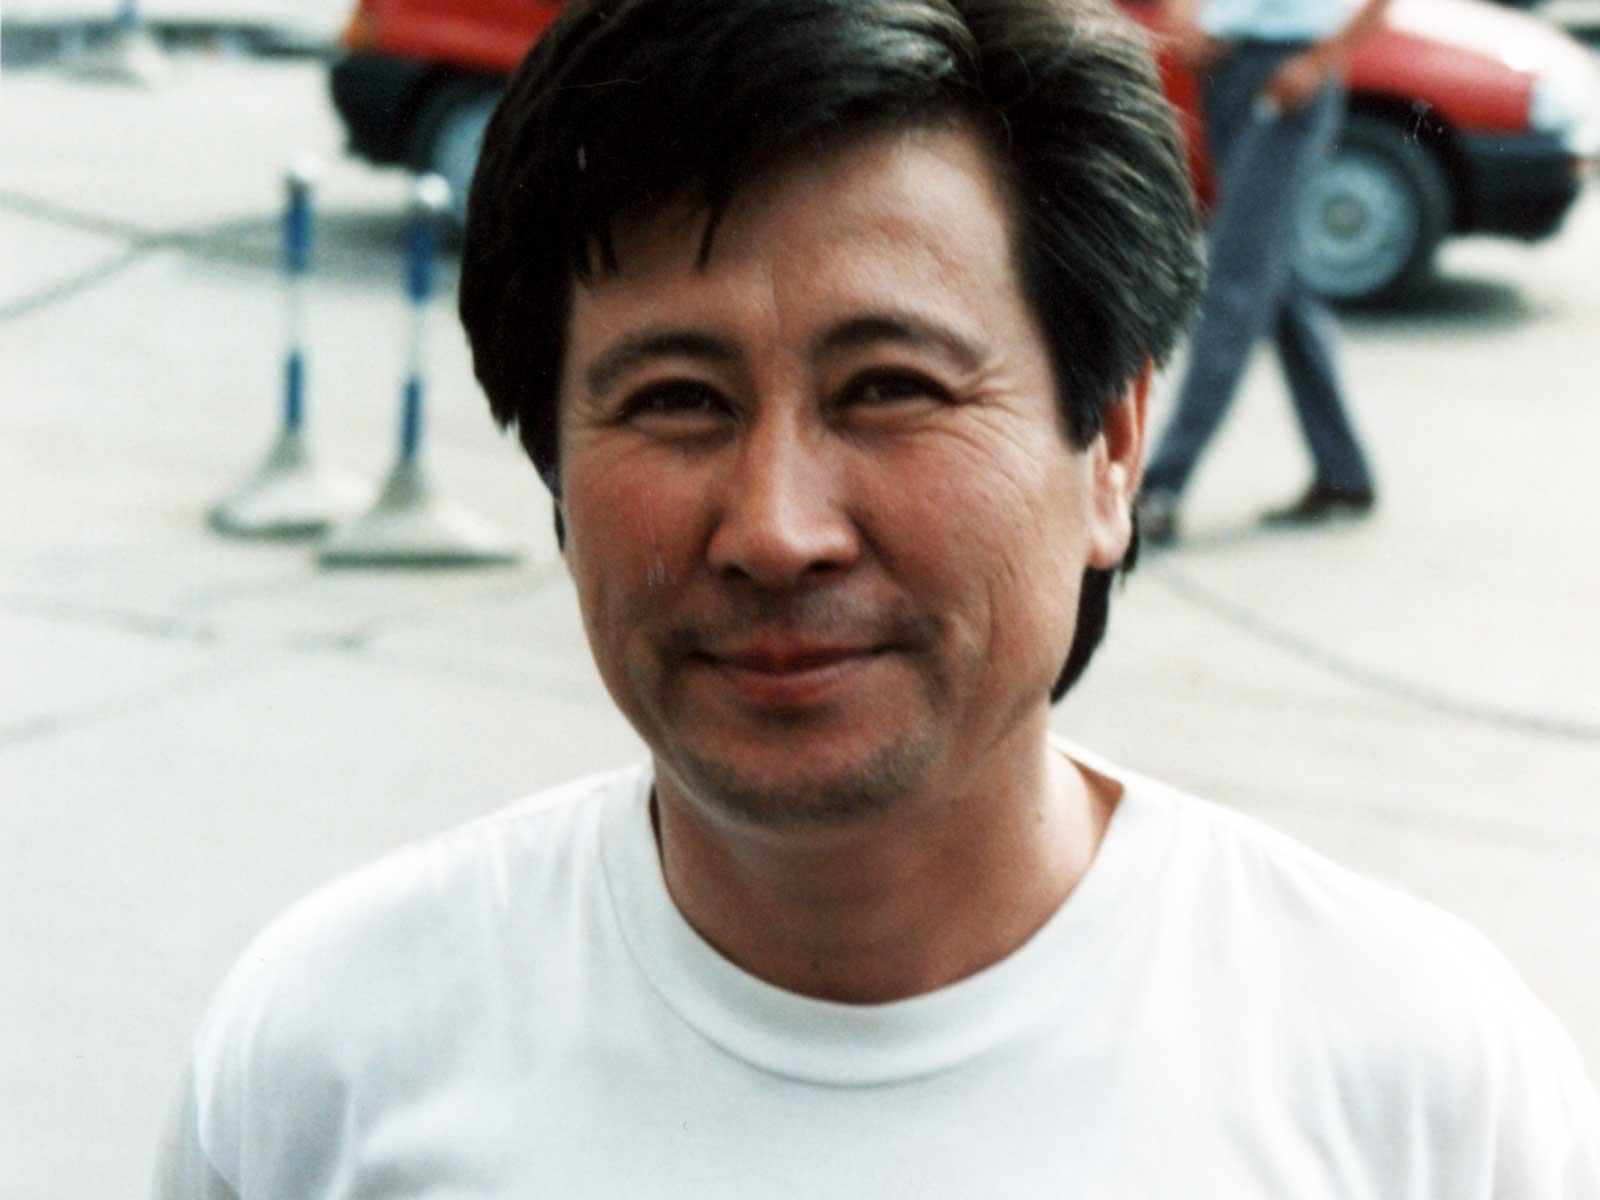 Silk Road Photo Journal 1995 - Mr Toordi Ashan - Uyghur - Urumqi - Dr Steven Andrew Martin - Study Abroad